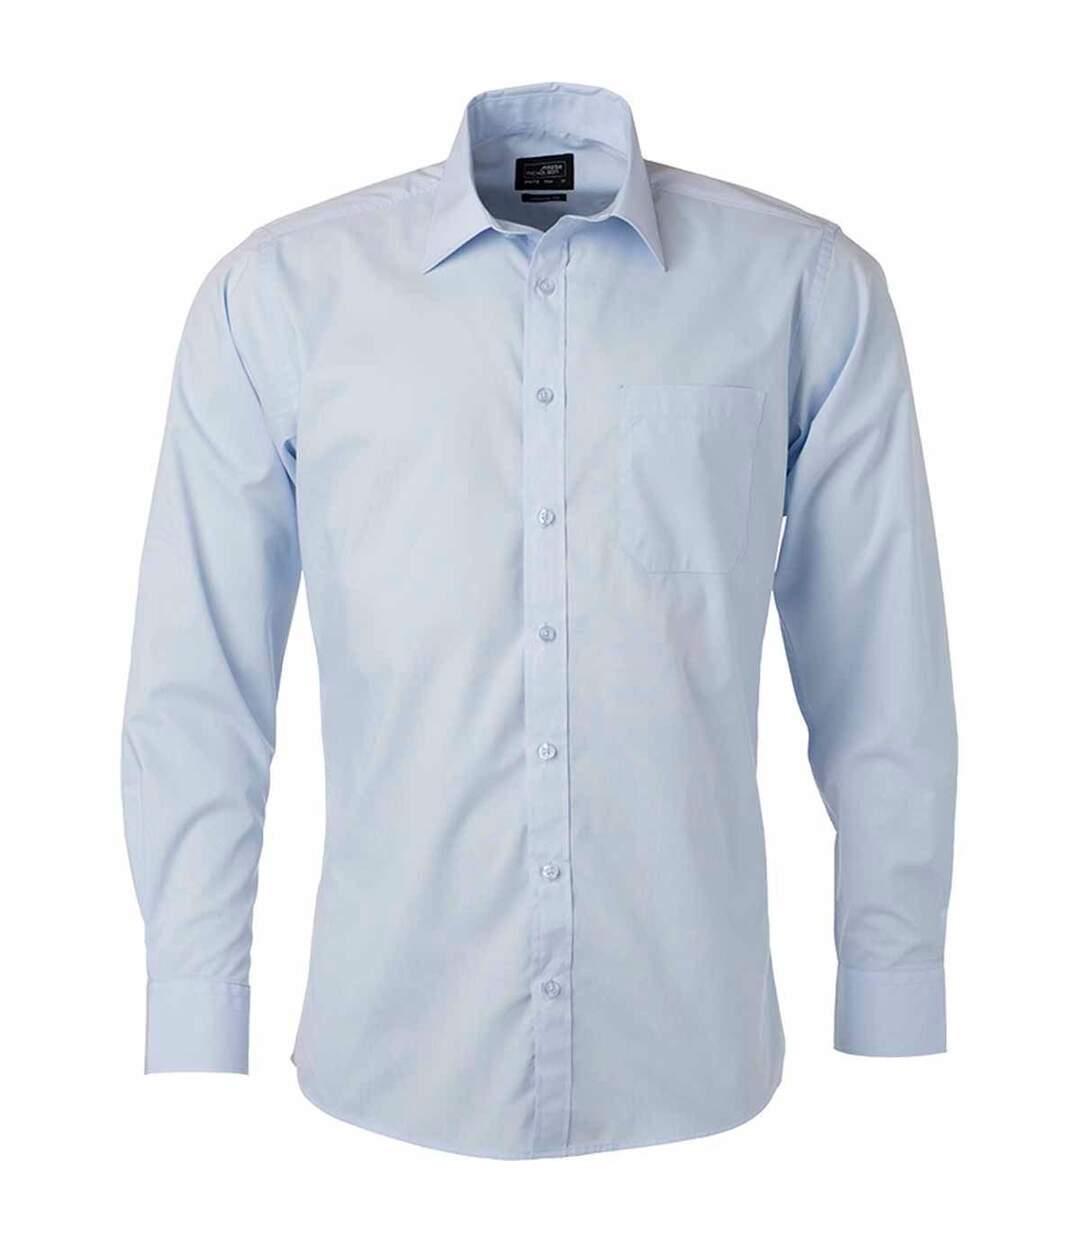 chemise popeline manches longues - JN678 - homme - bleu clair